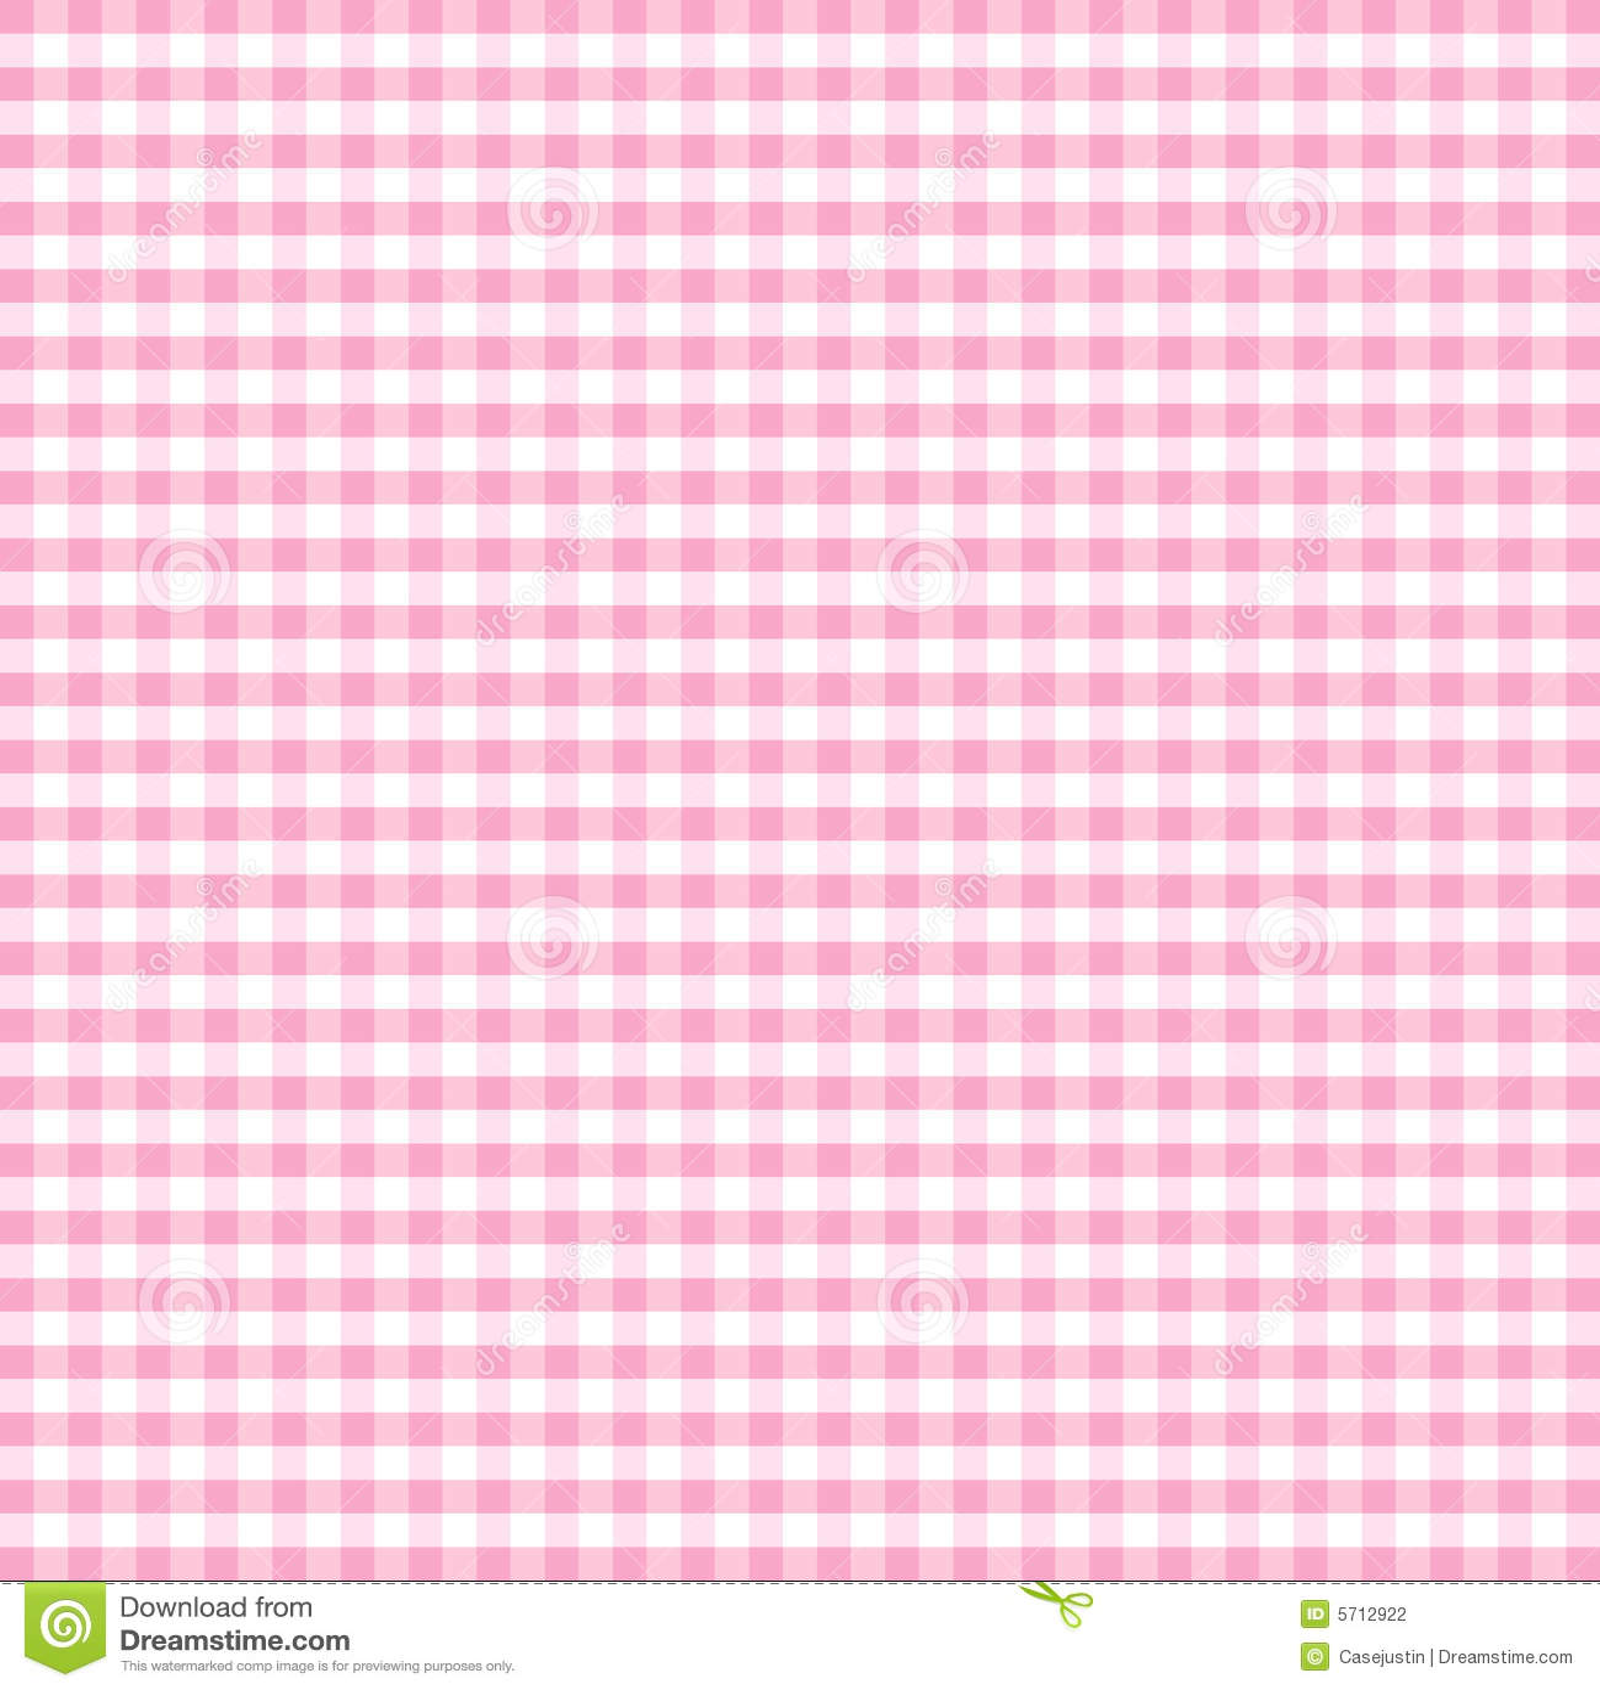 Seamless Gingham Background, Pastel Pink